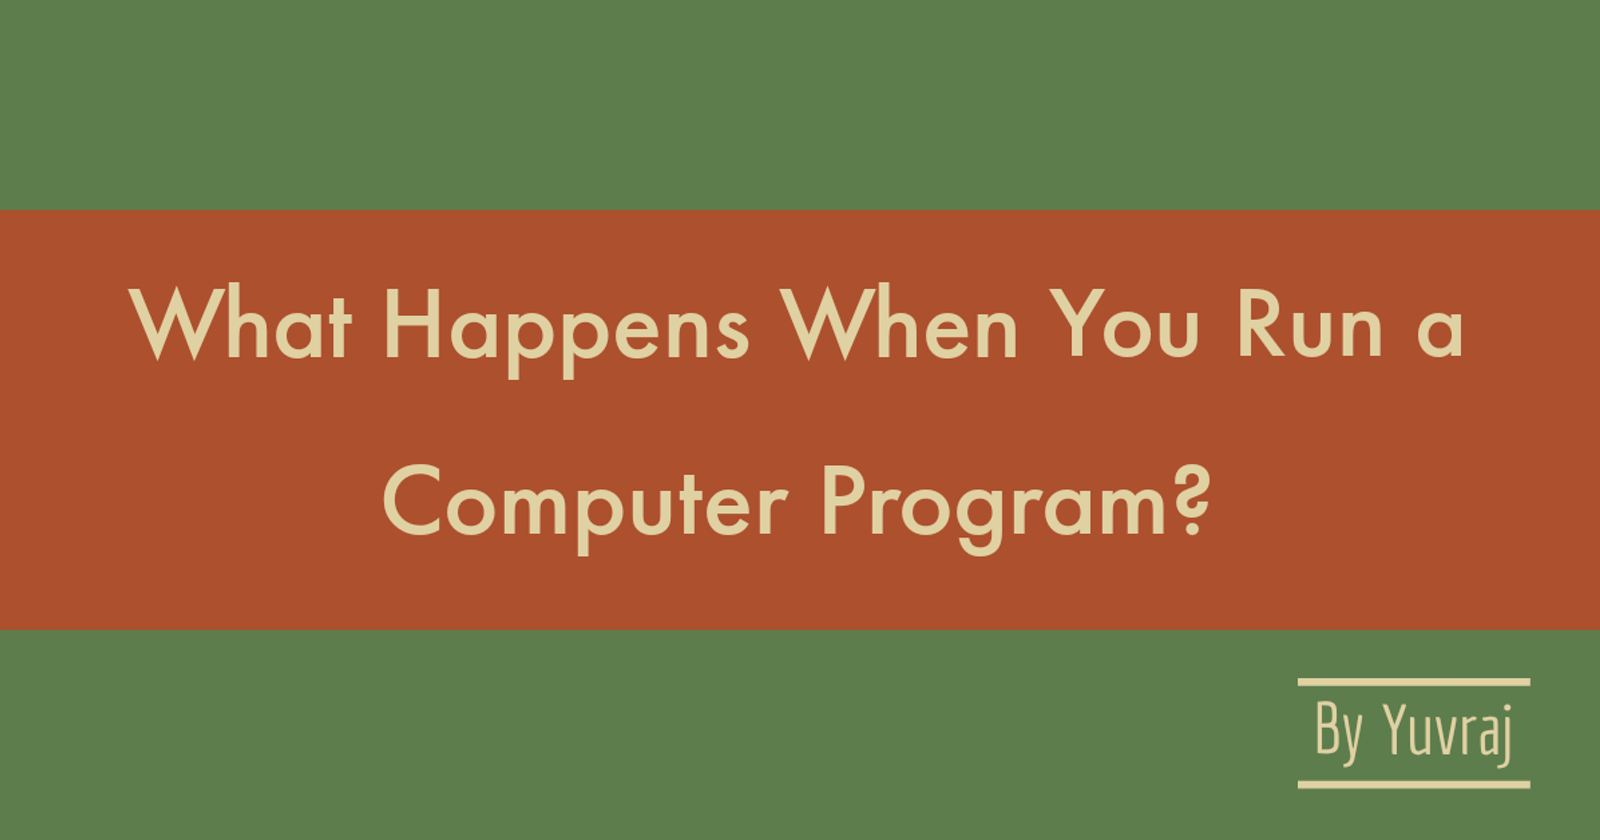 What Happens When You Run a Computer Program